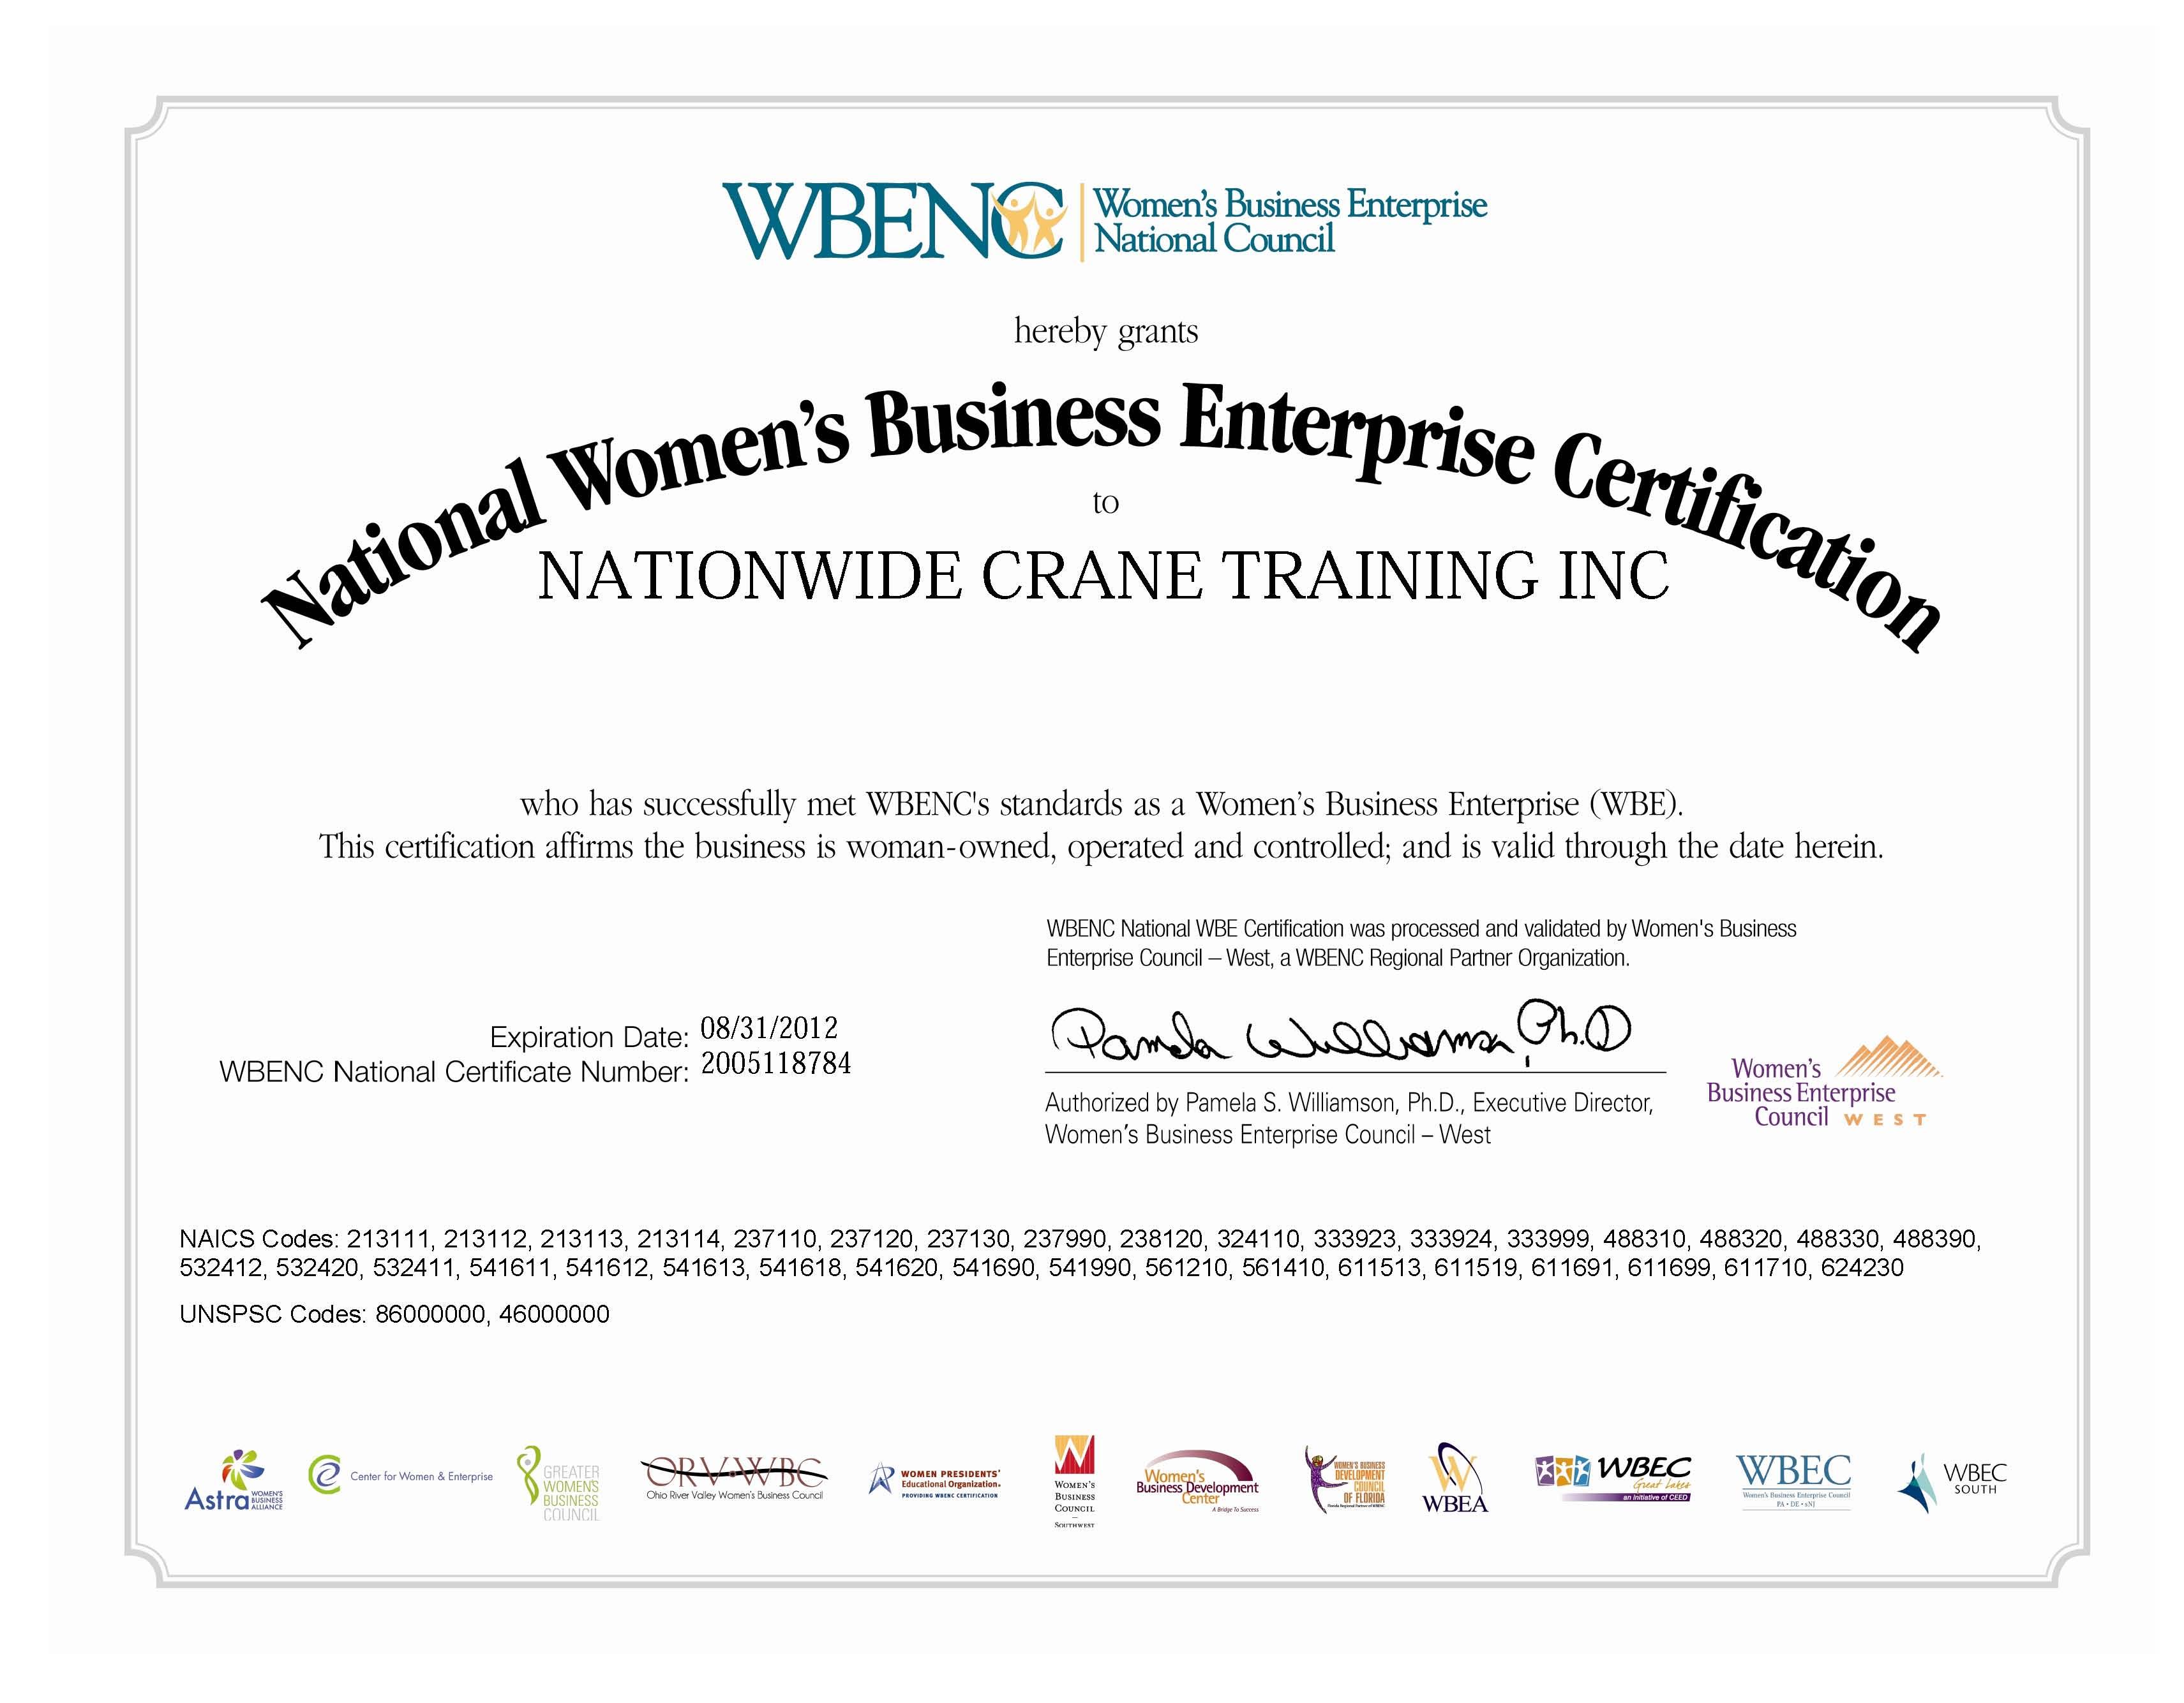 Nationwide Crane Training WBENC Certification